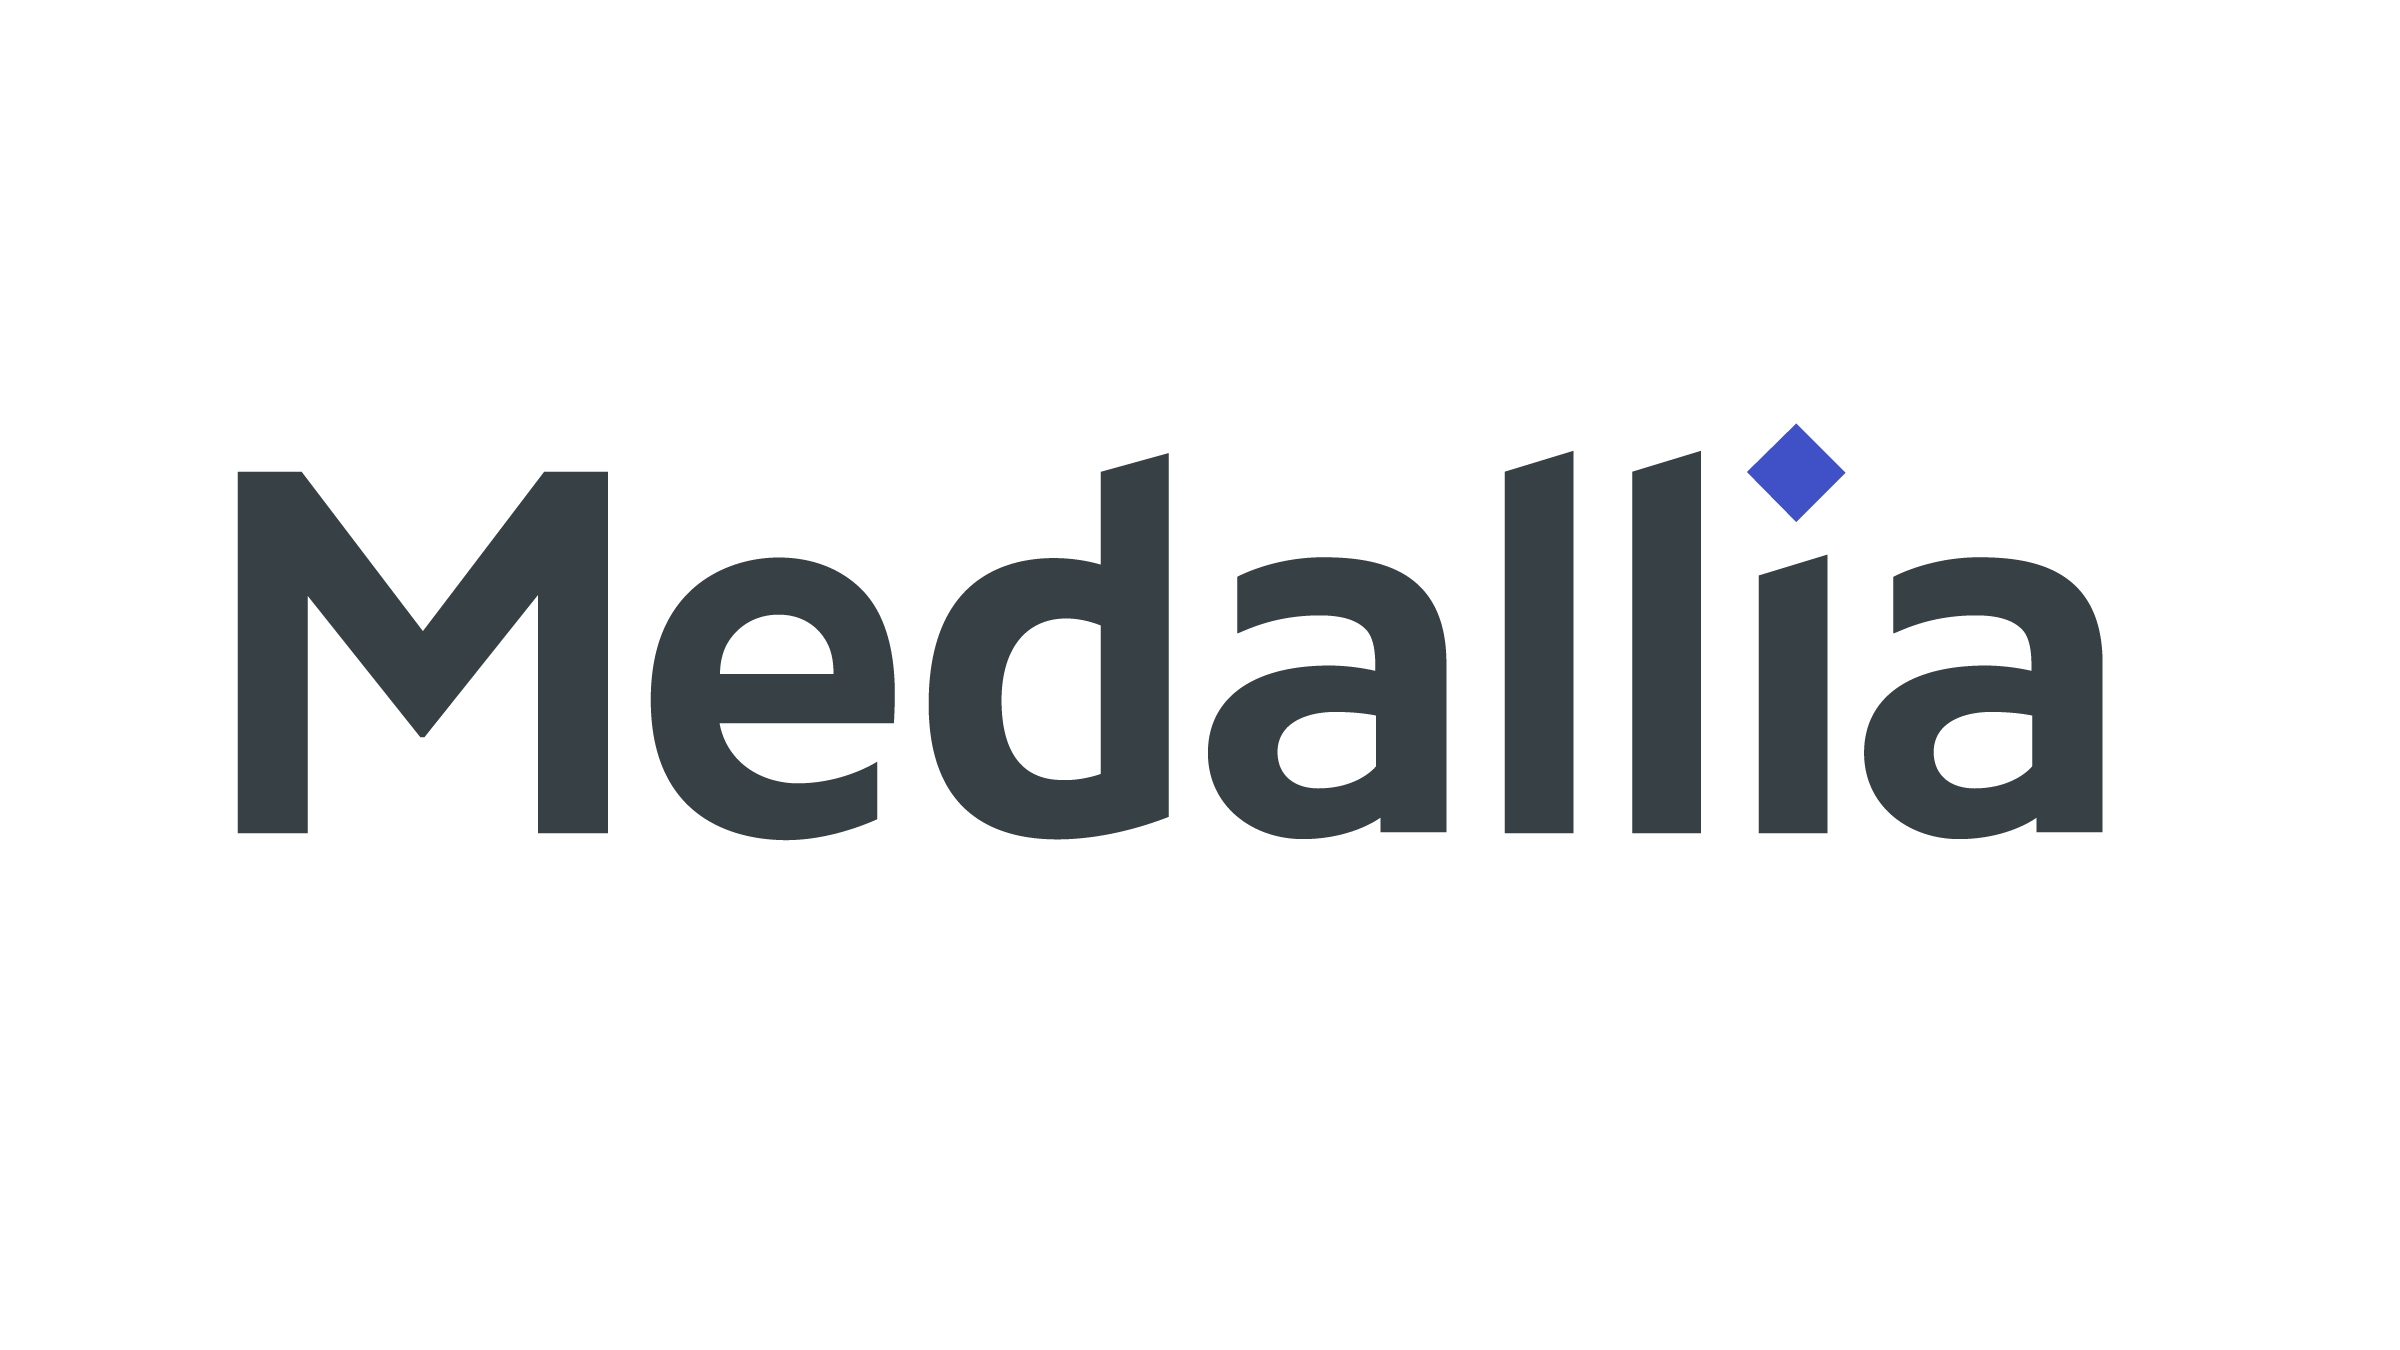 Medallia_logo_new.png